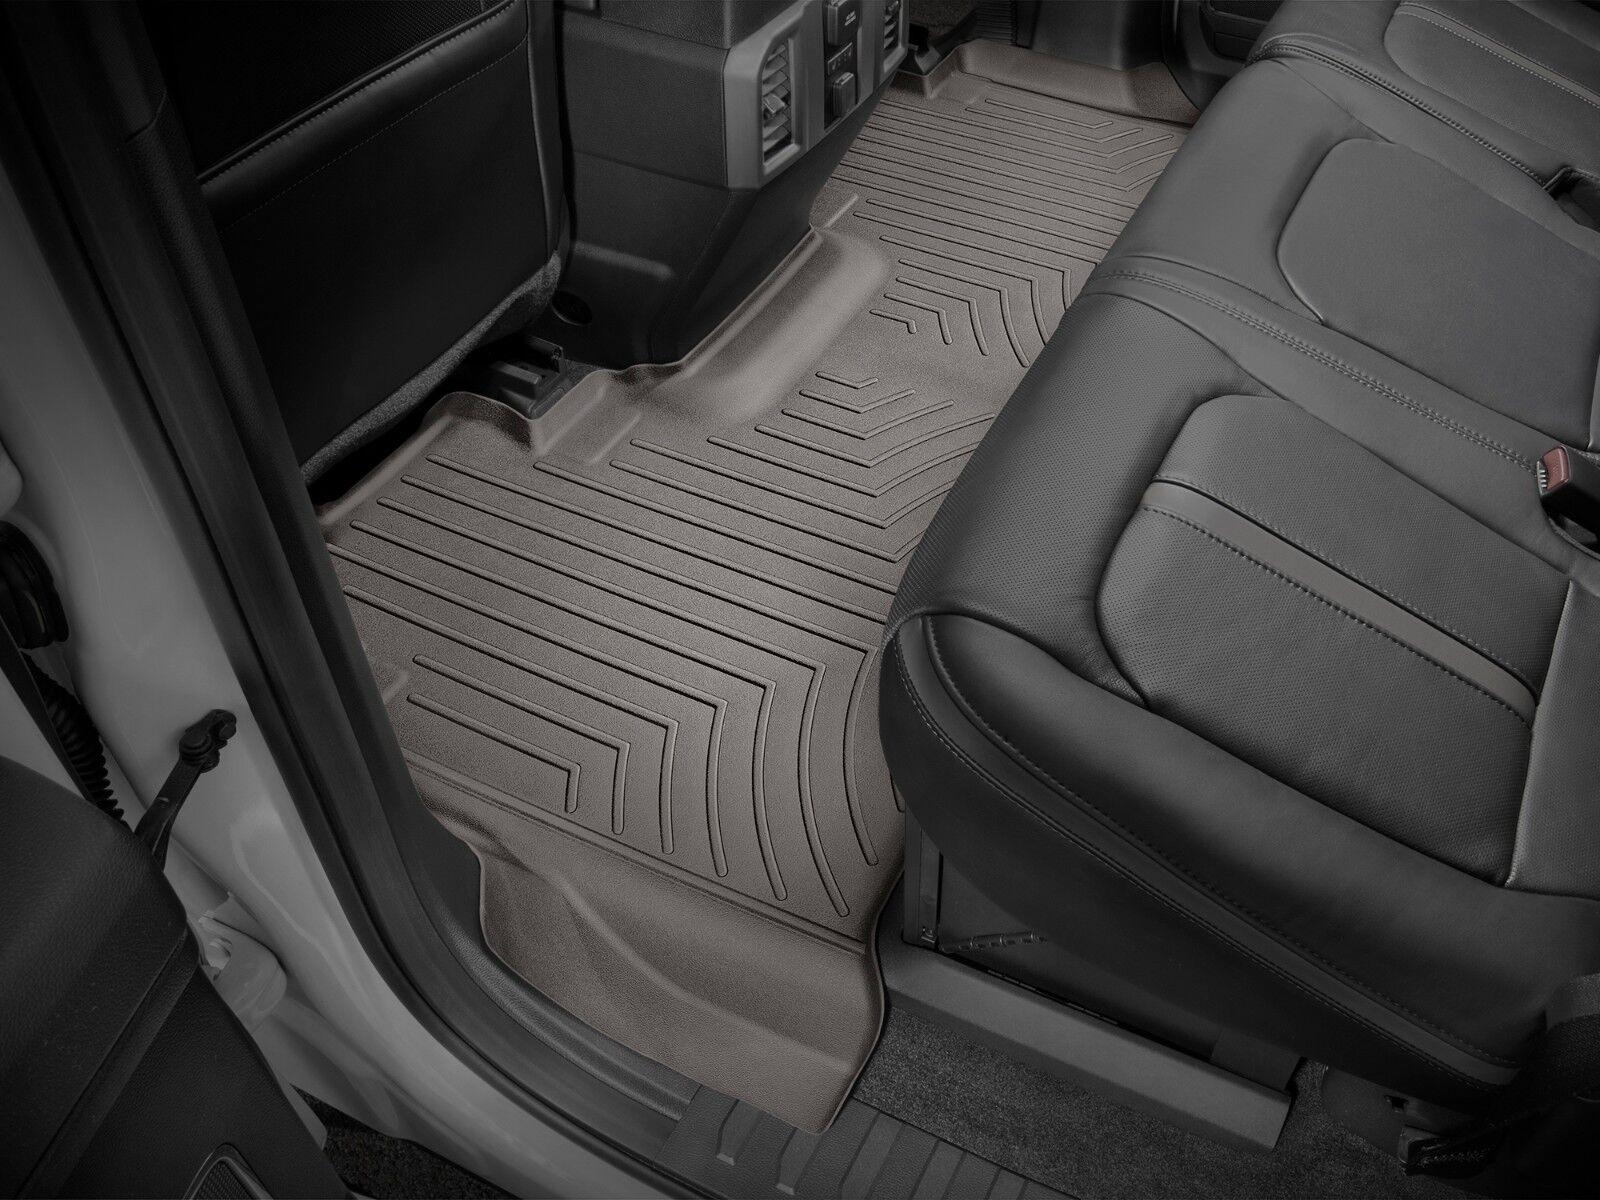 ford amazon com dp duty automotive fit floor weathertech cab mats super custom front floorliner tan for regular